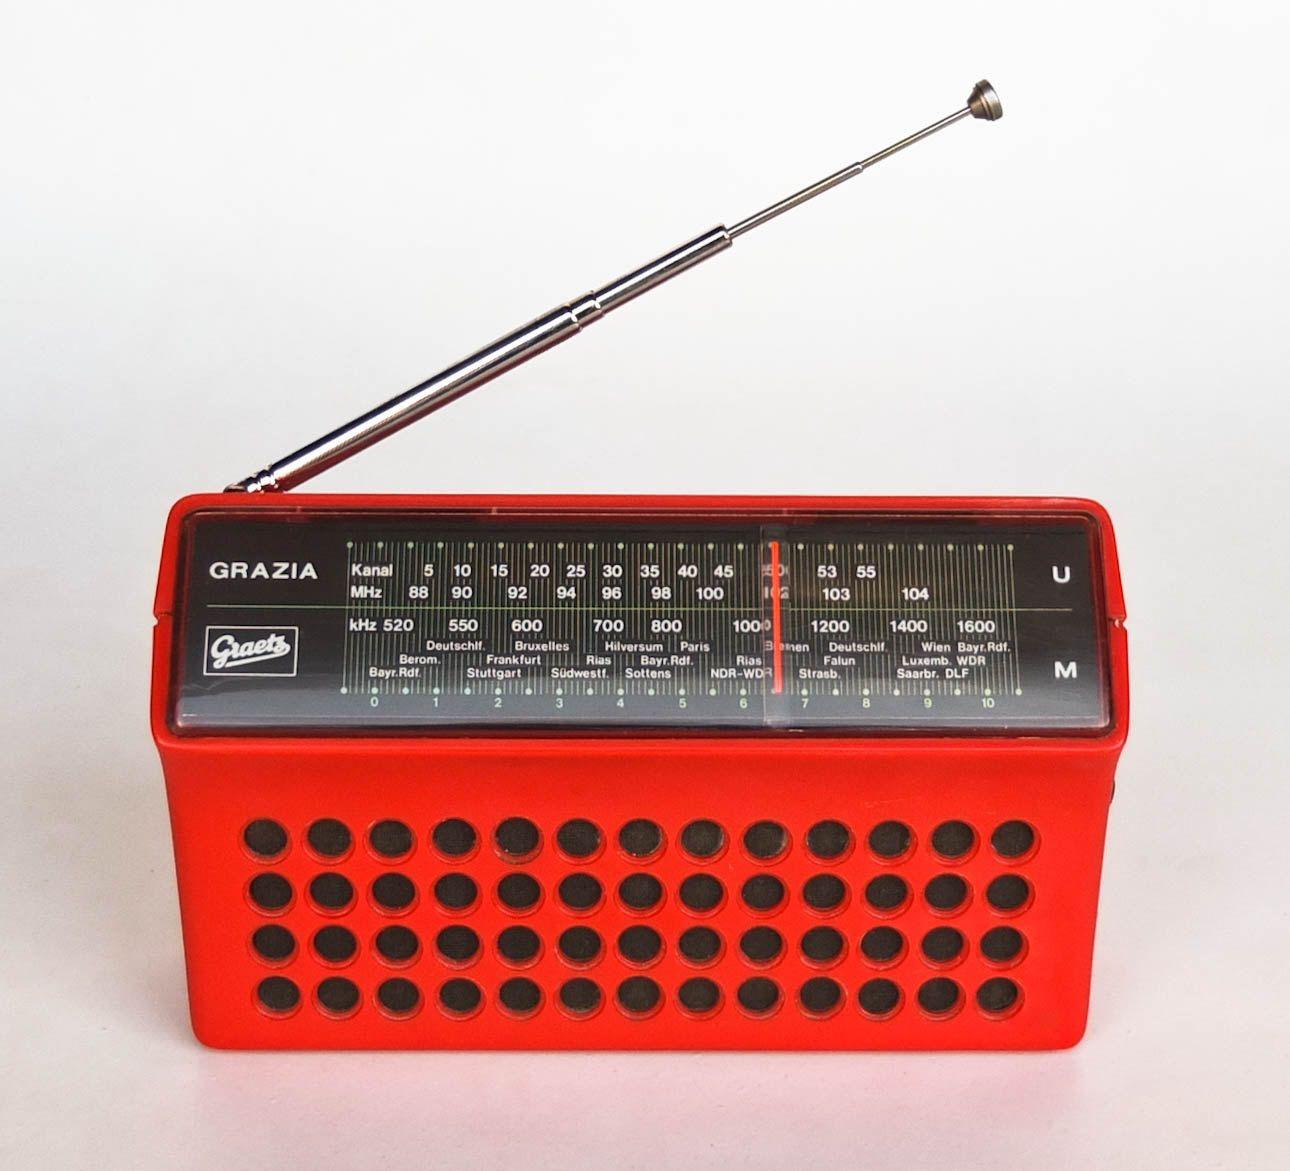 Vintage Mini Radio Transistor / Graetz Grazia Automatic 305 / Portable /  70s Germany / Red